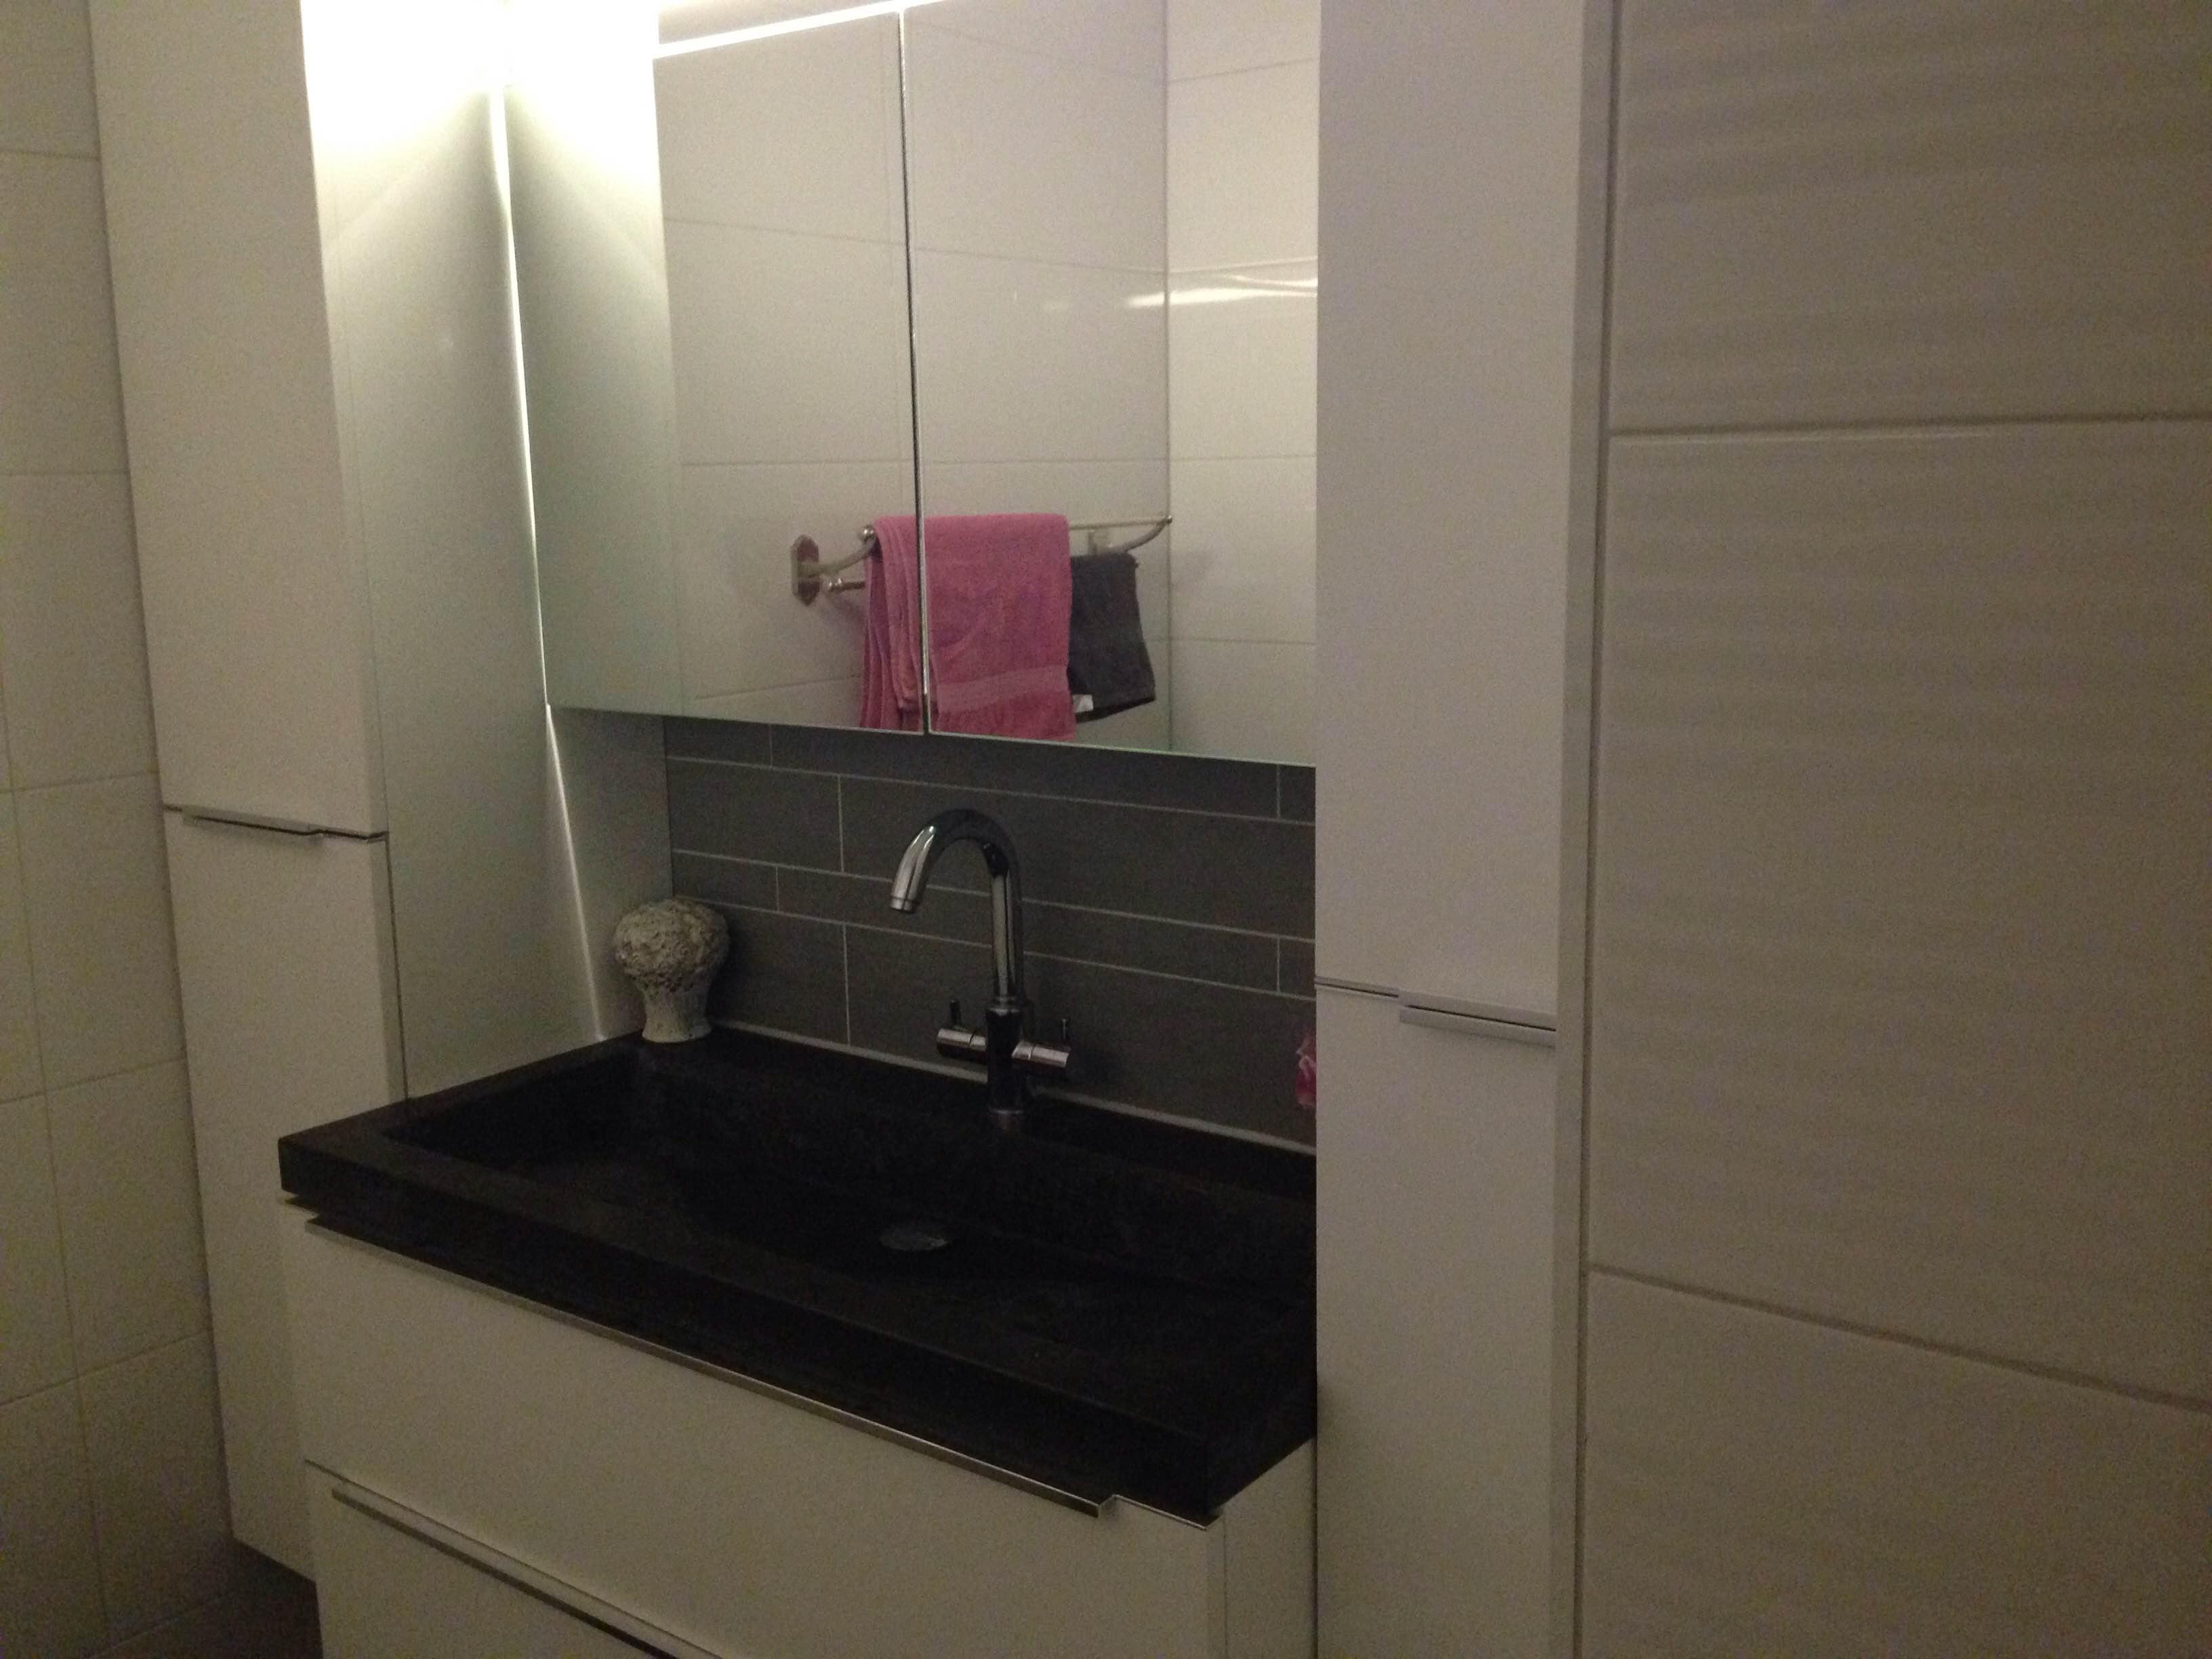 badkamer design ideeen badkamer design inloopdouche badkamer